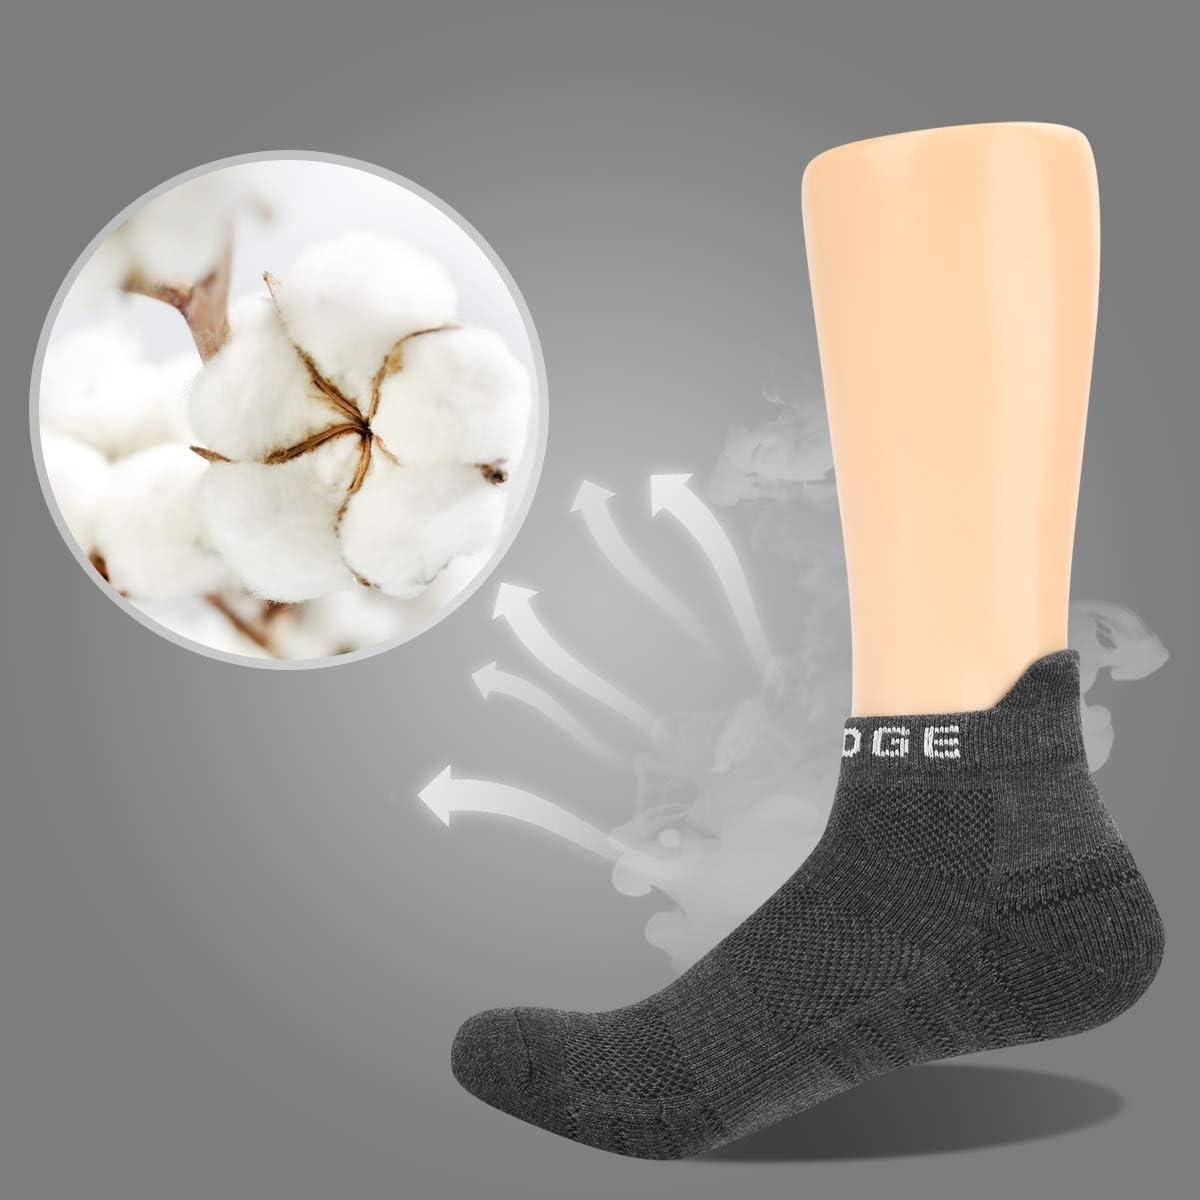 YUEDGE 5 Paar Low Cut Sportsocken Sneakersocken Kn/öchelsocken Laufsport Running-Socken f/ür Herren